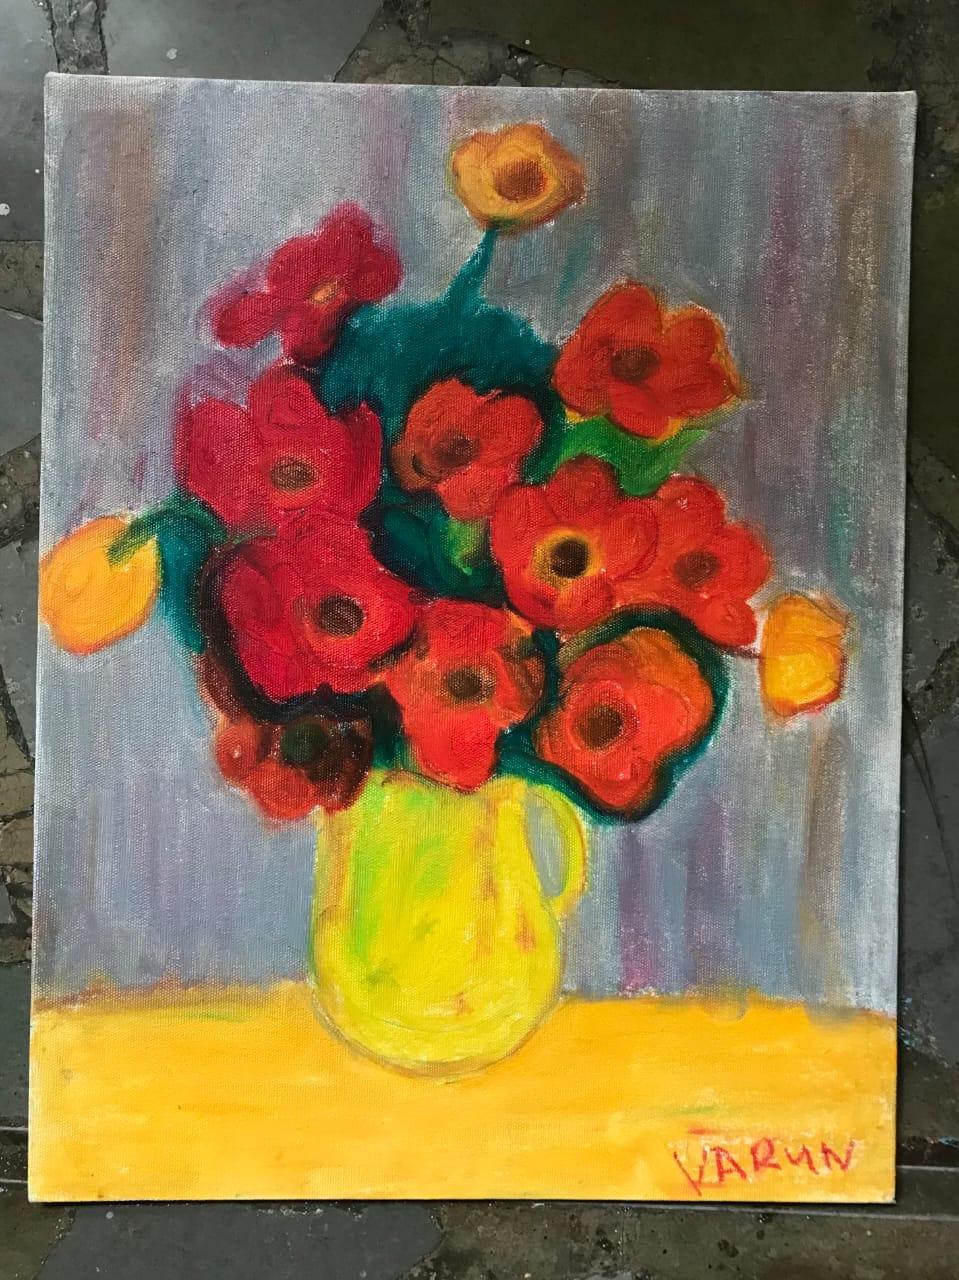 Bouquet of Flowers Slider 1/1